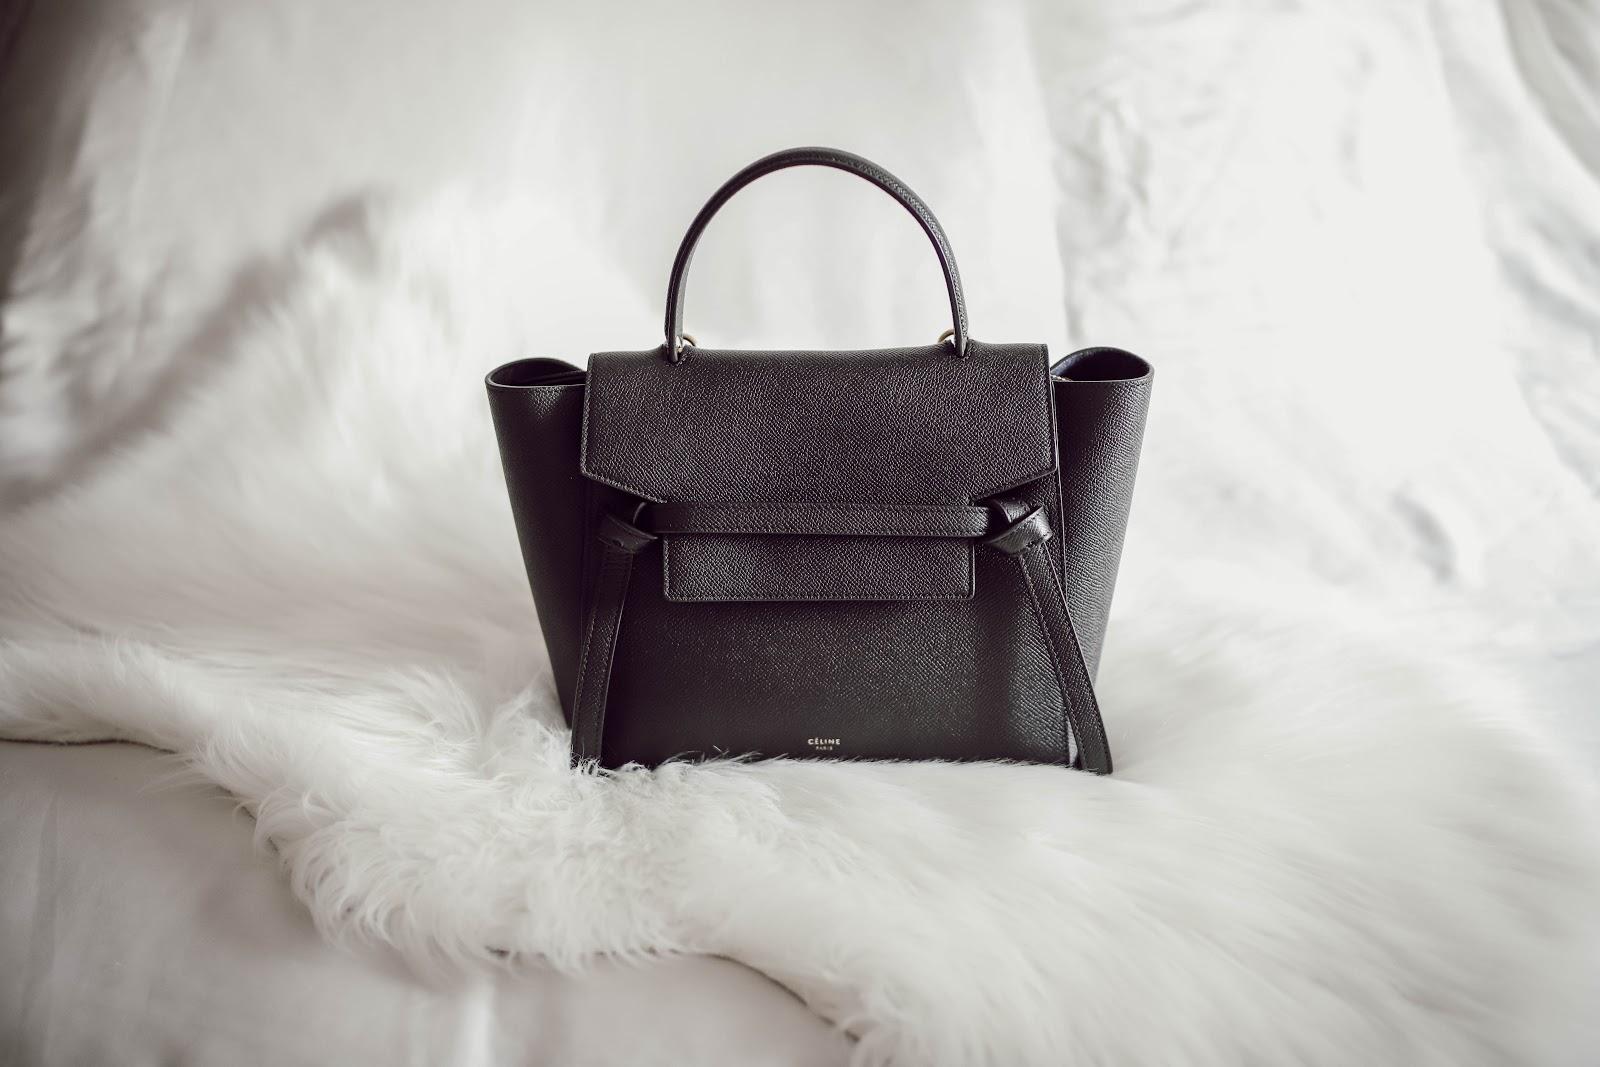 6a379f1567 Céline Micro Belt Bag